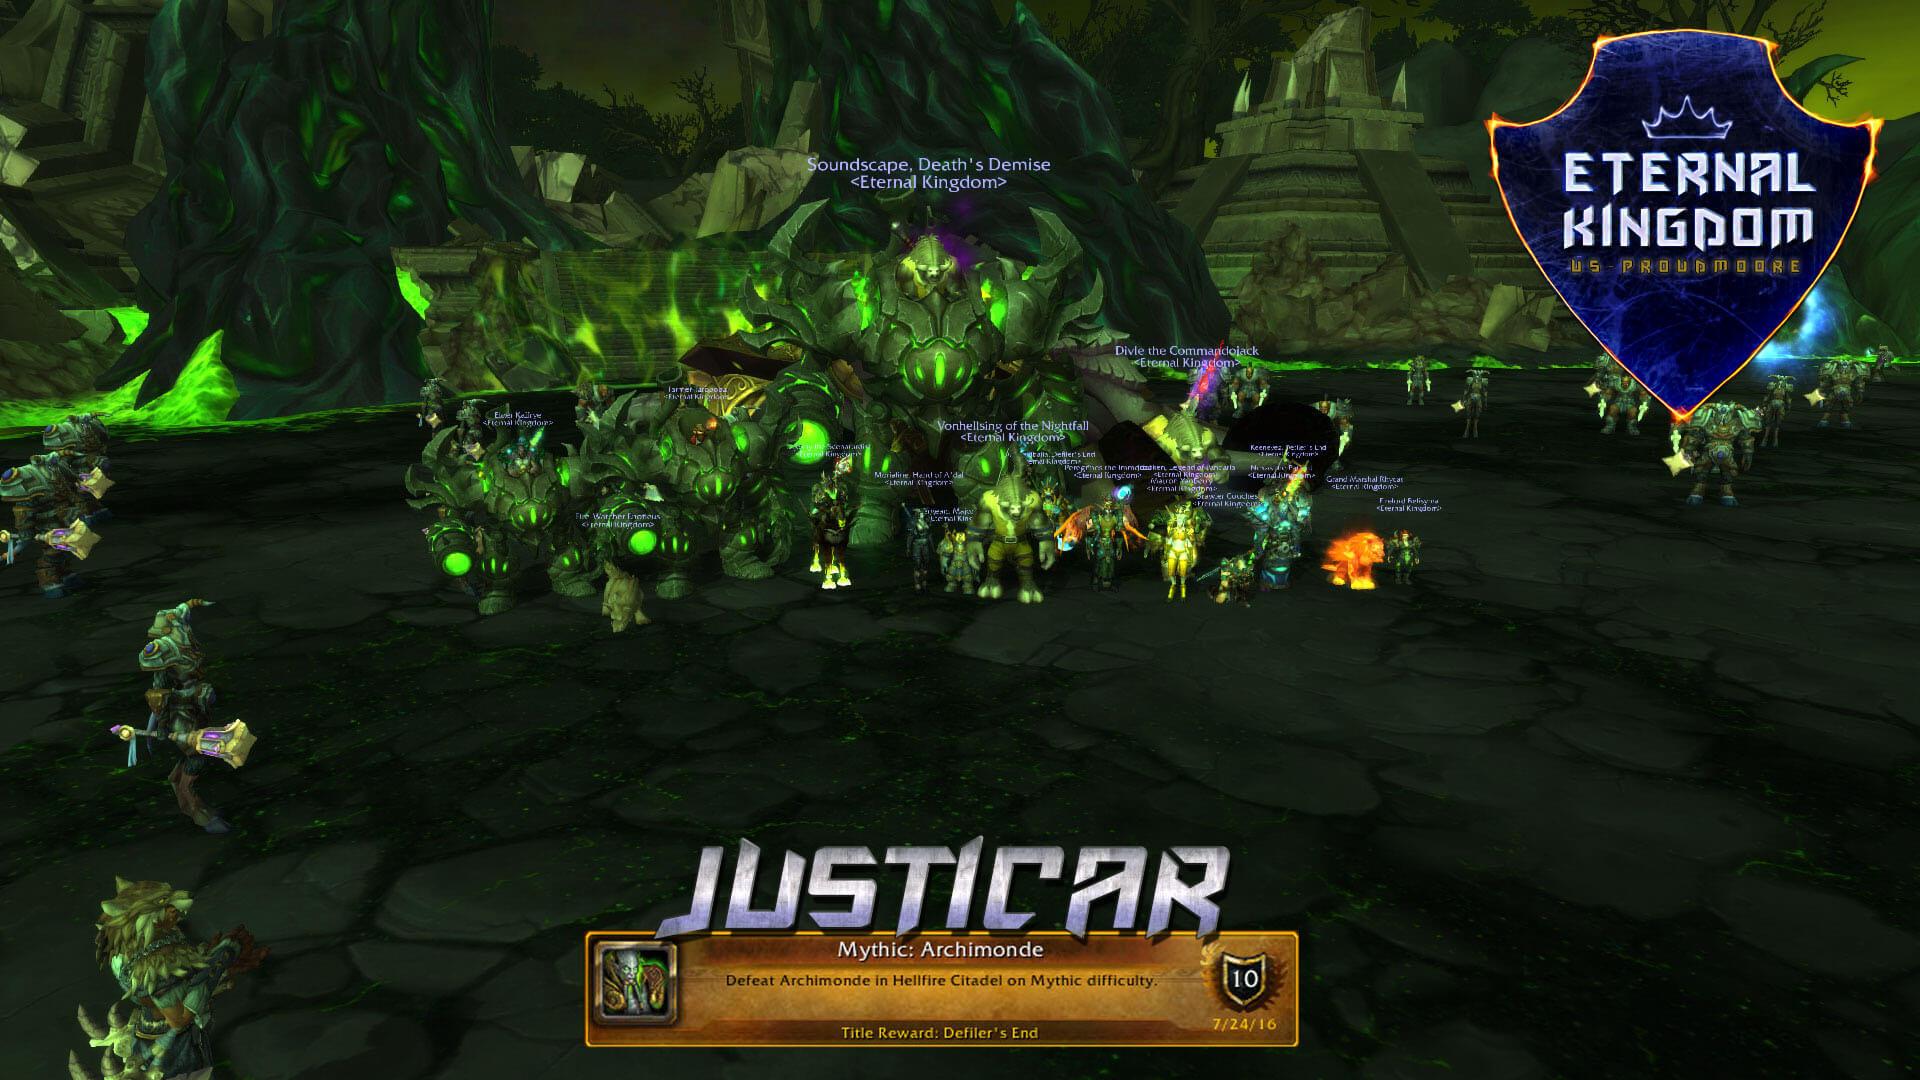 Justicar Team Defeats Mythic Archimonde